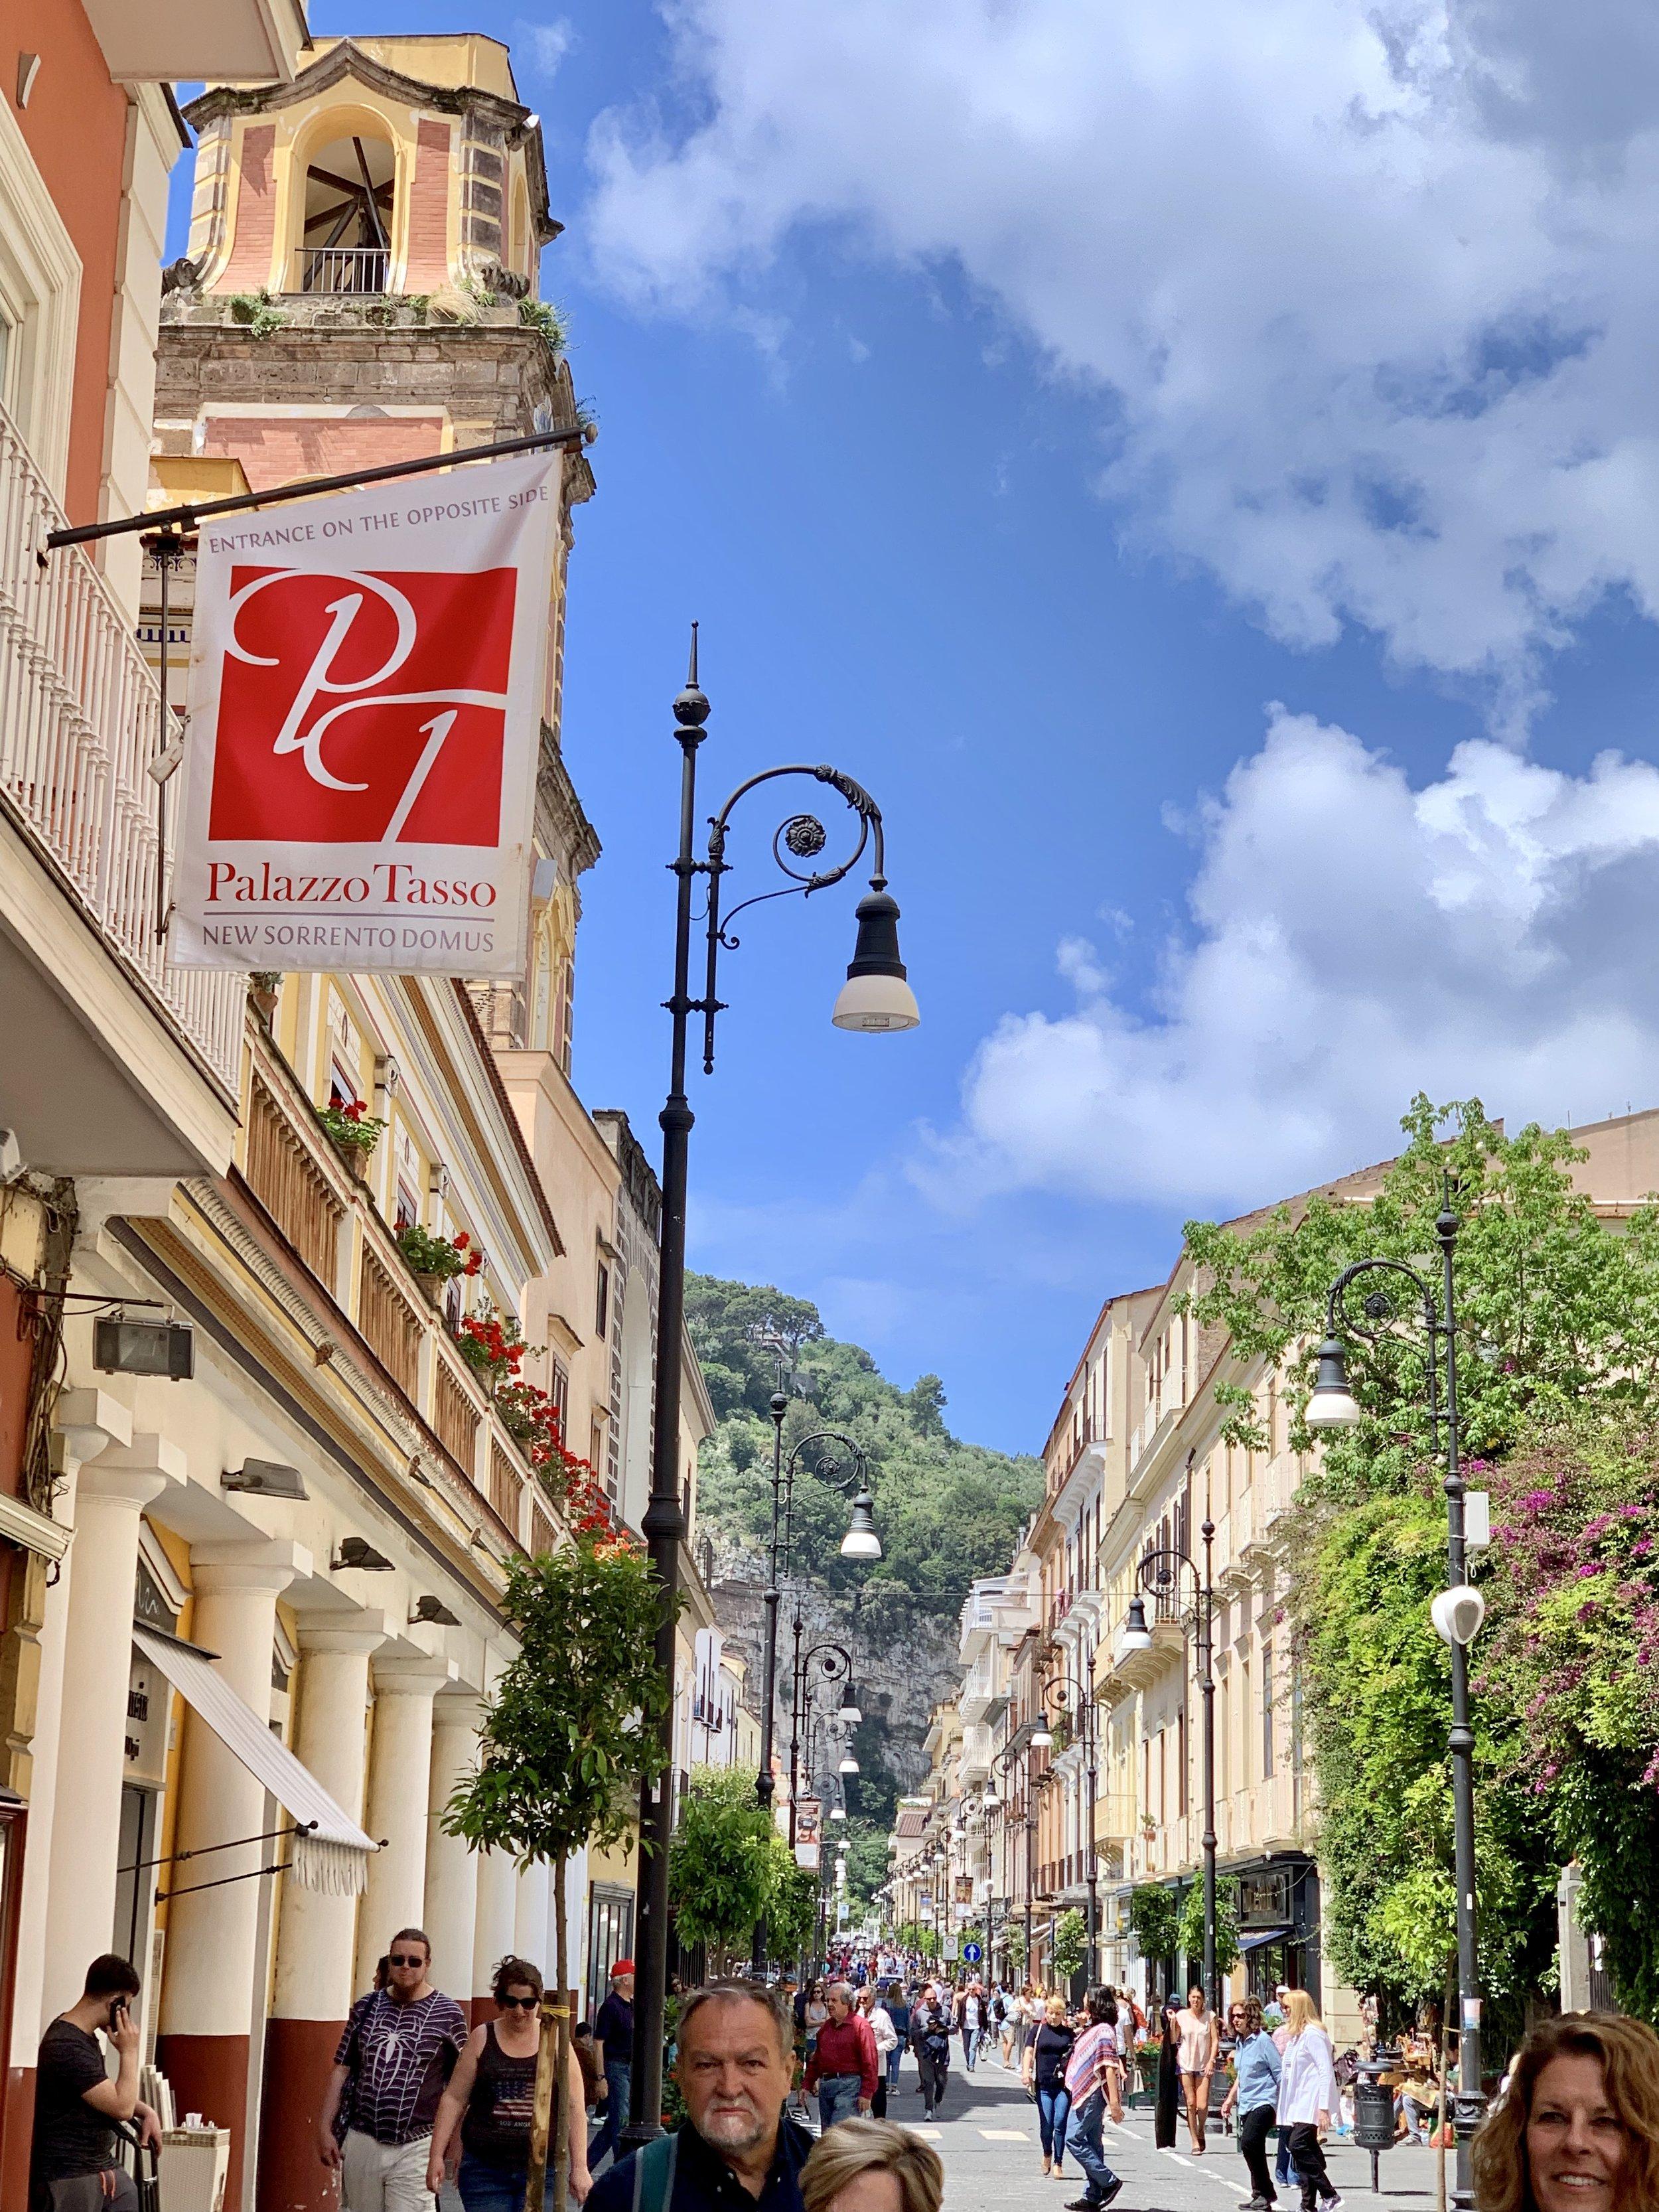 Sorrento high street